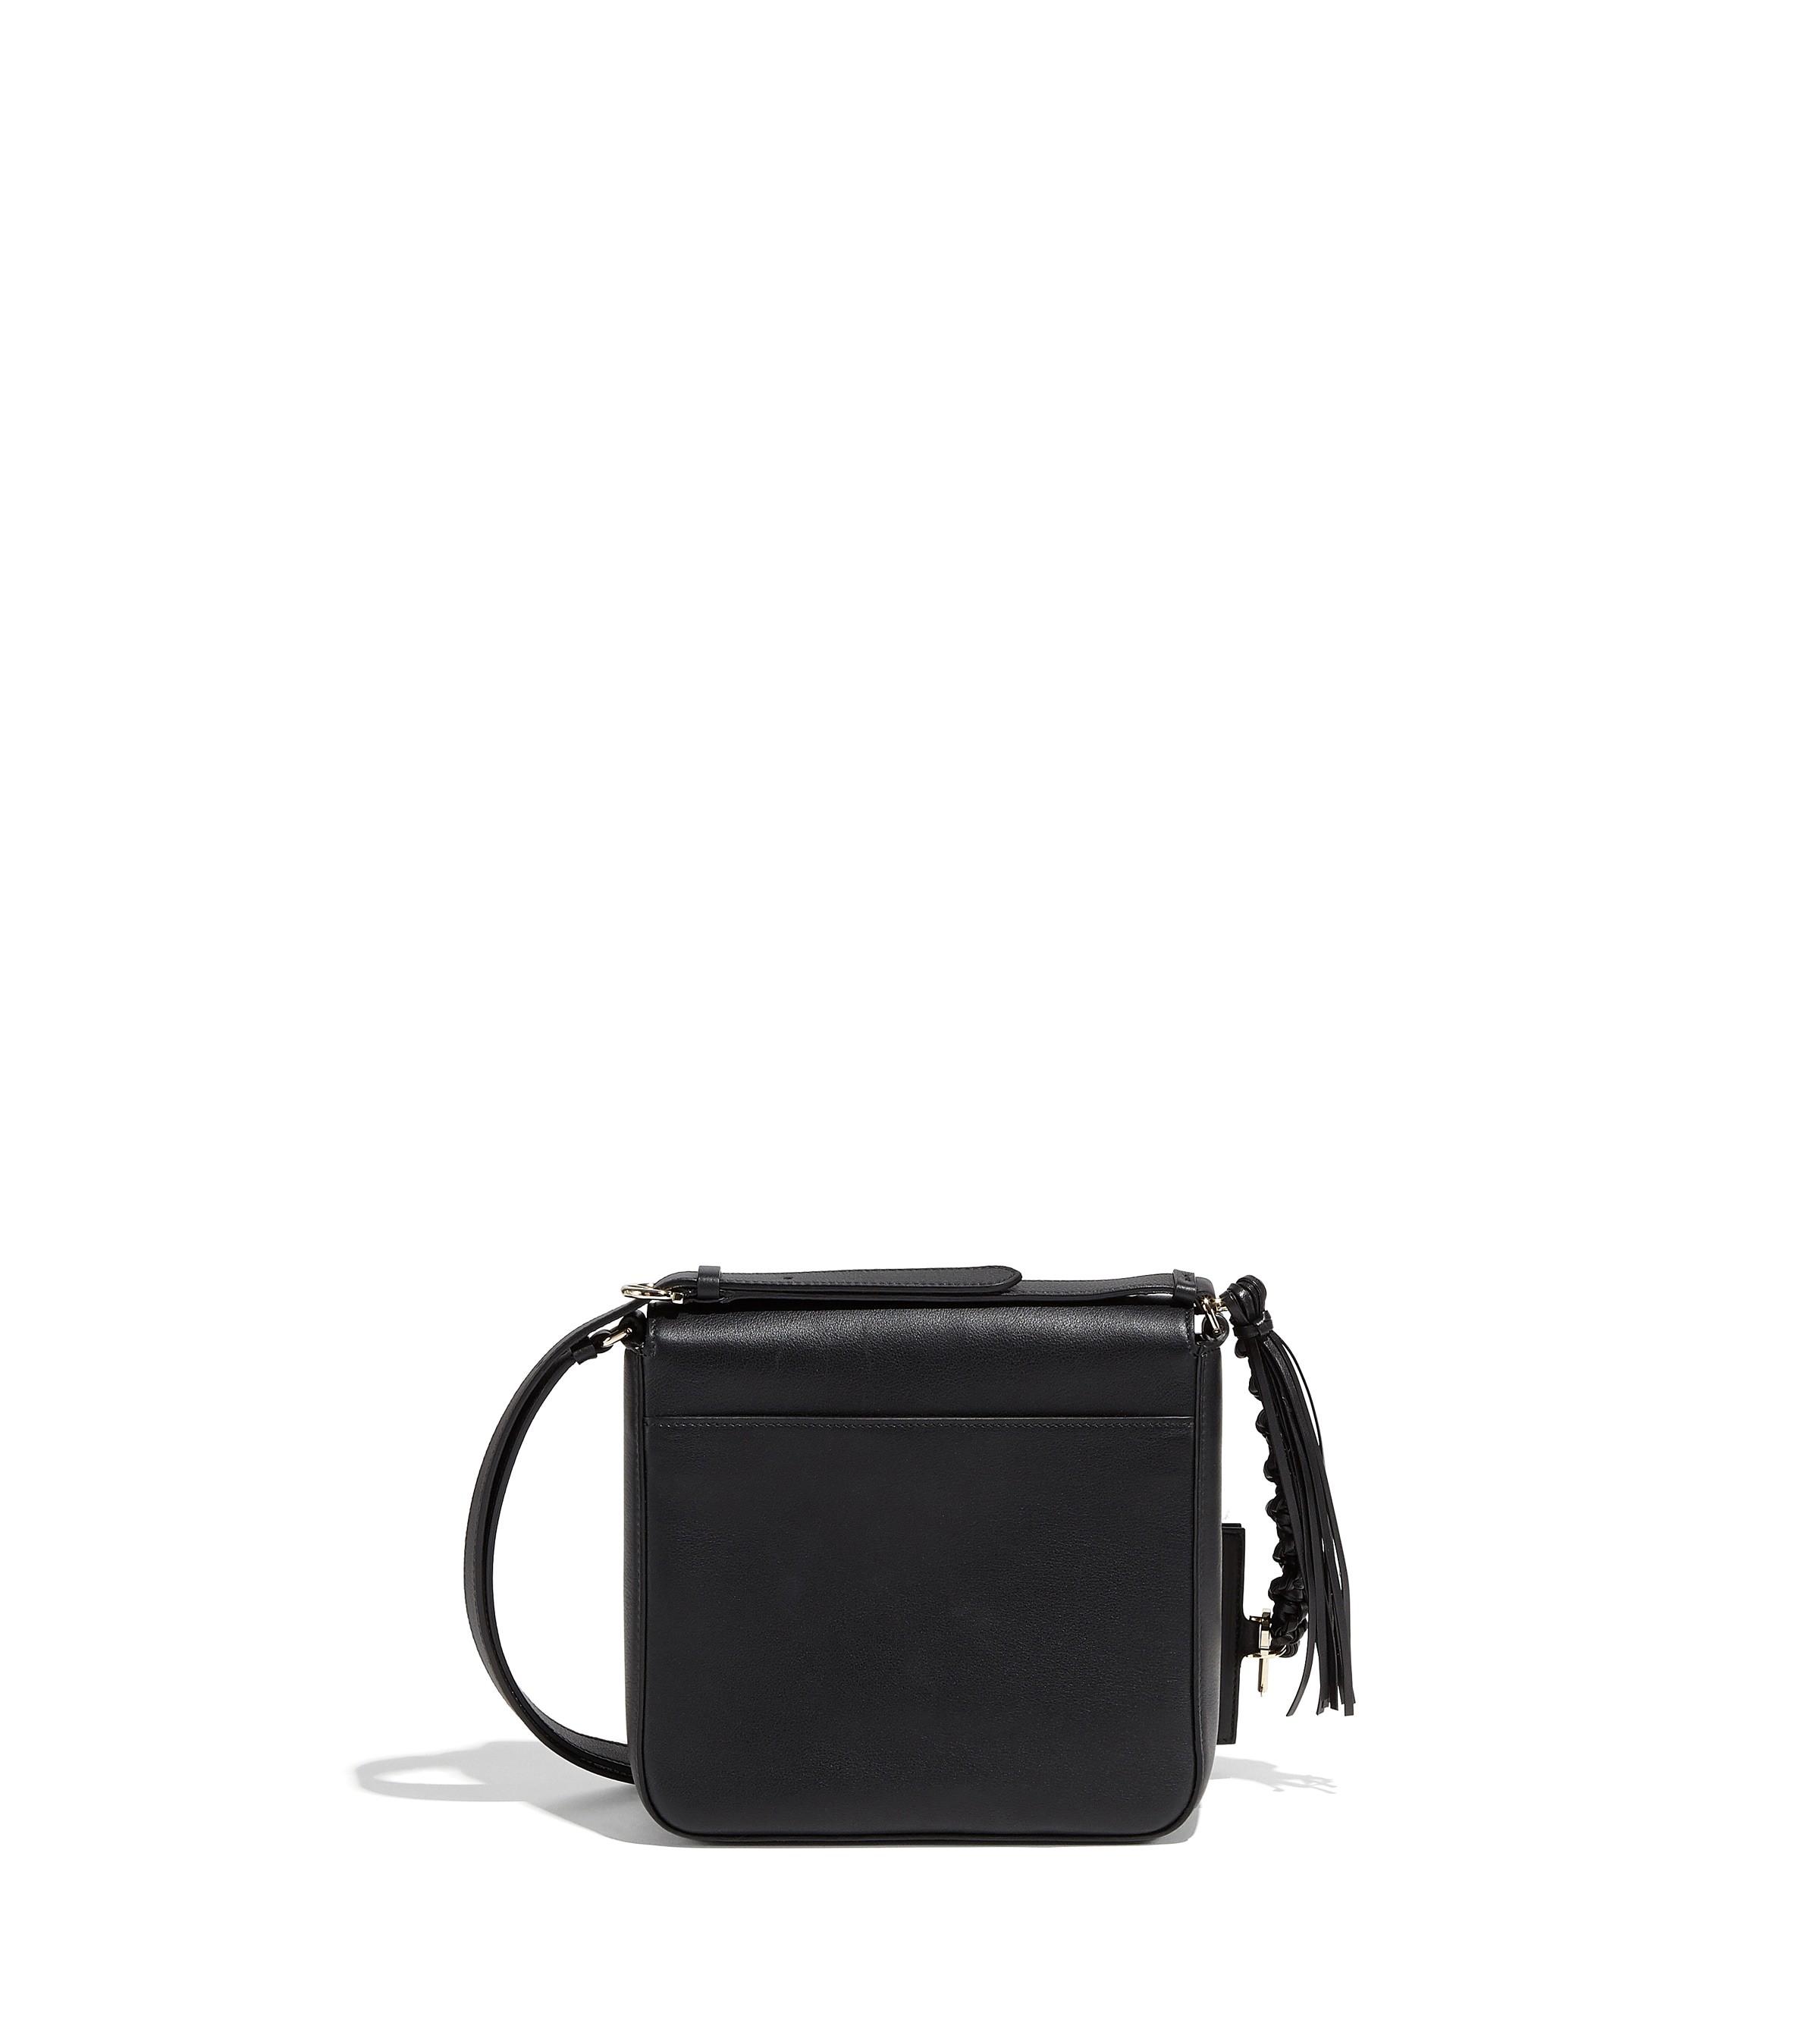 8484a313cc Salvatore Ferragamo Gancini Lock Flap Bag - Black